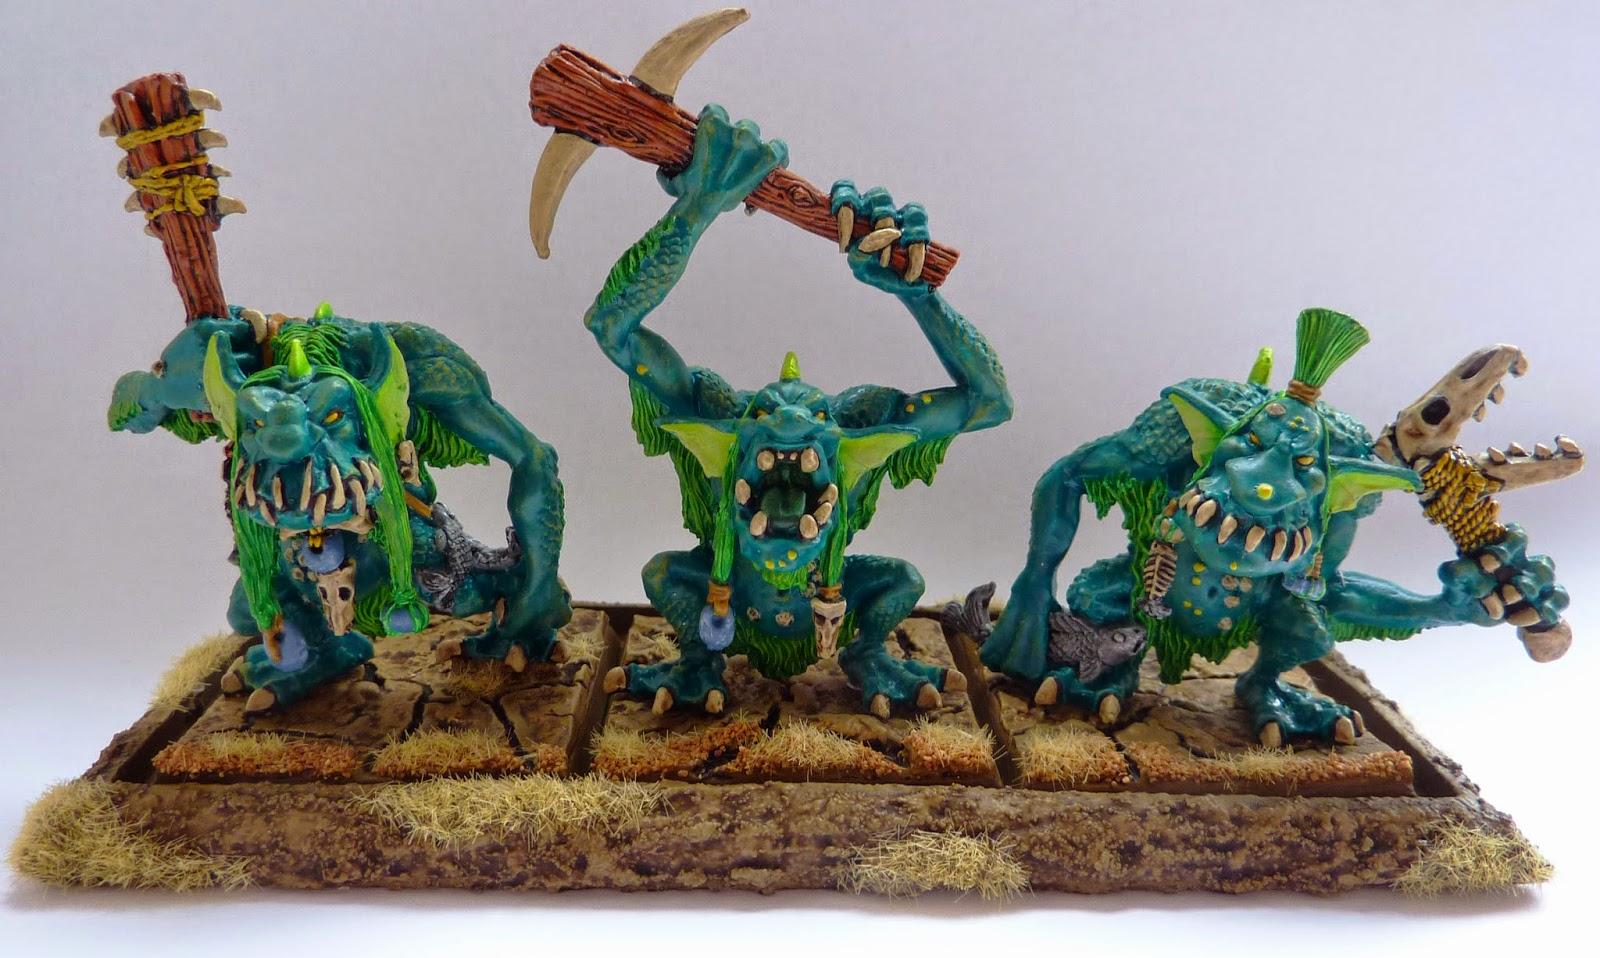 Classic Warhammer River Trolls